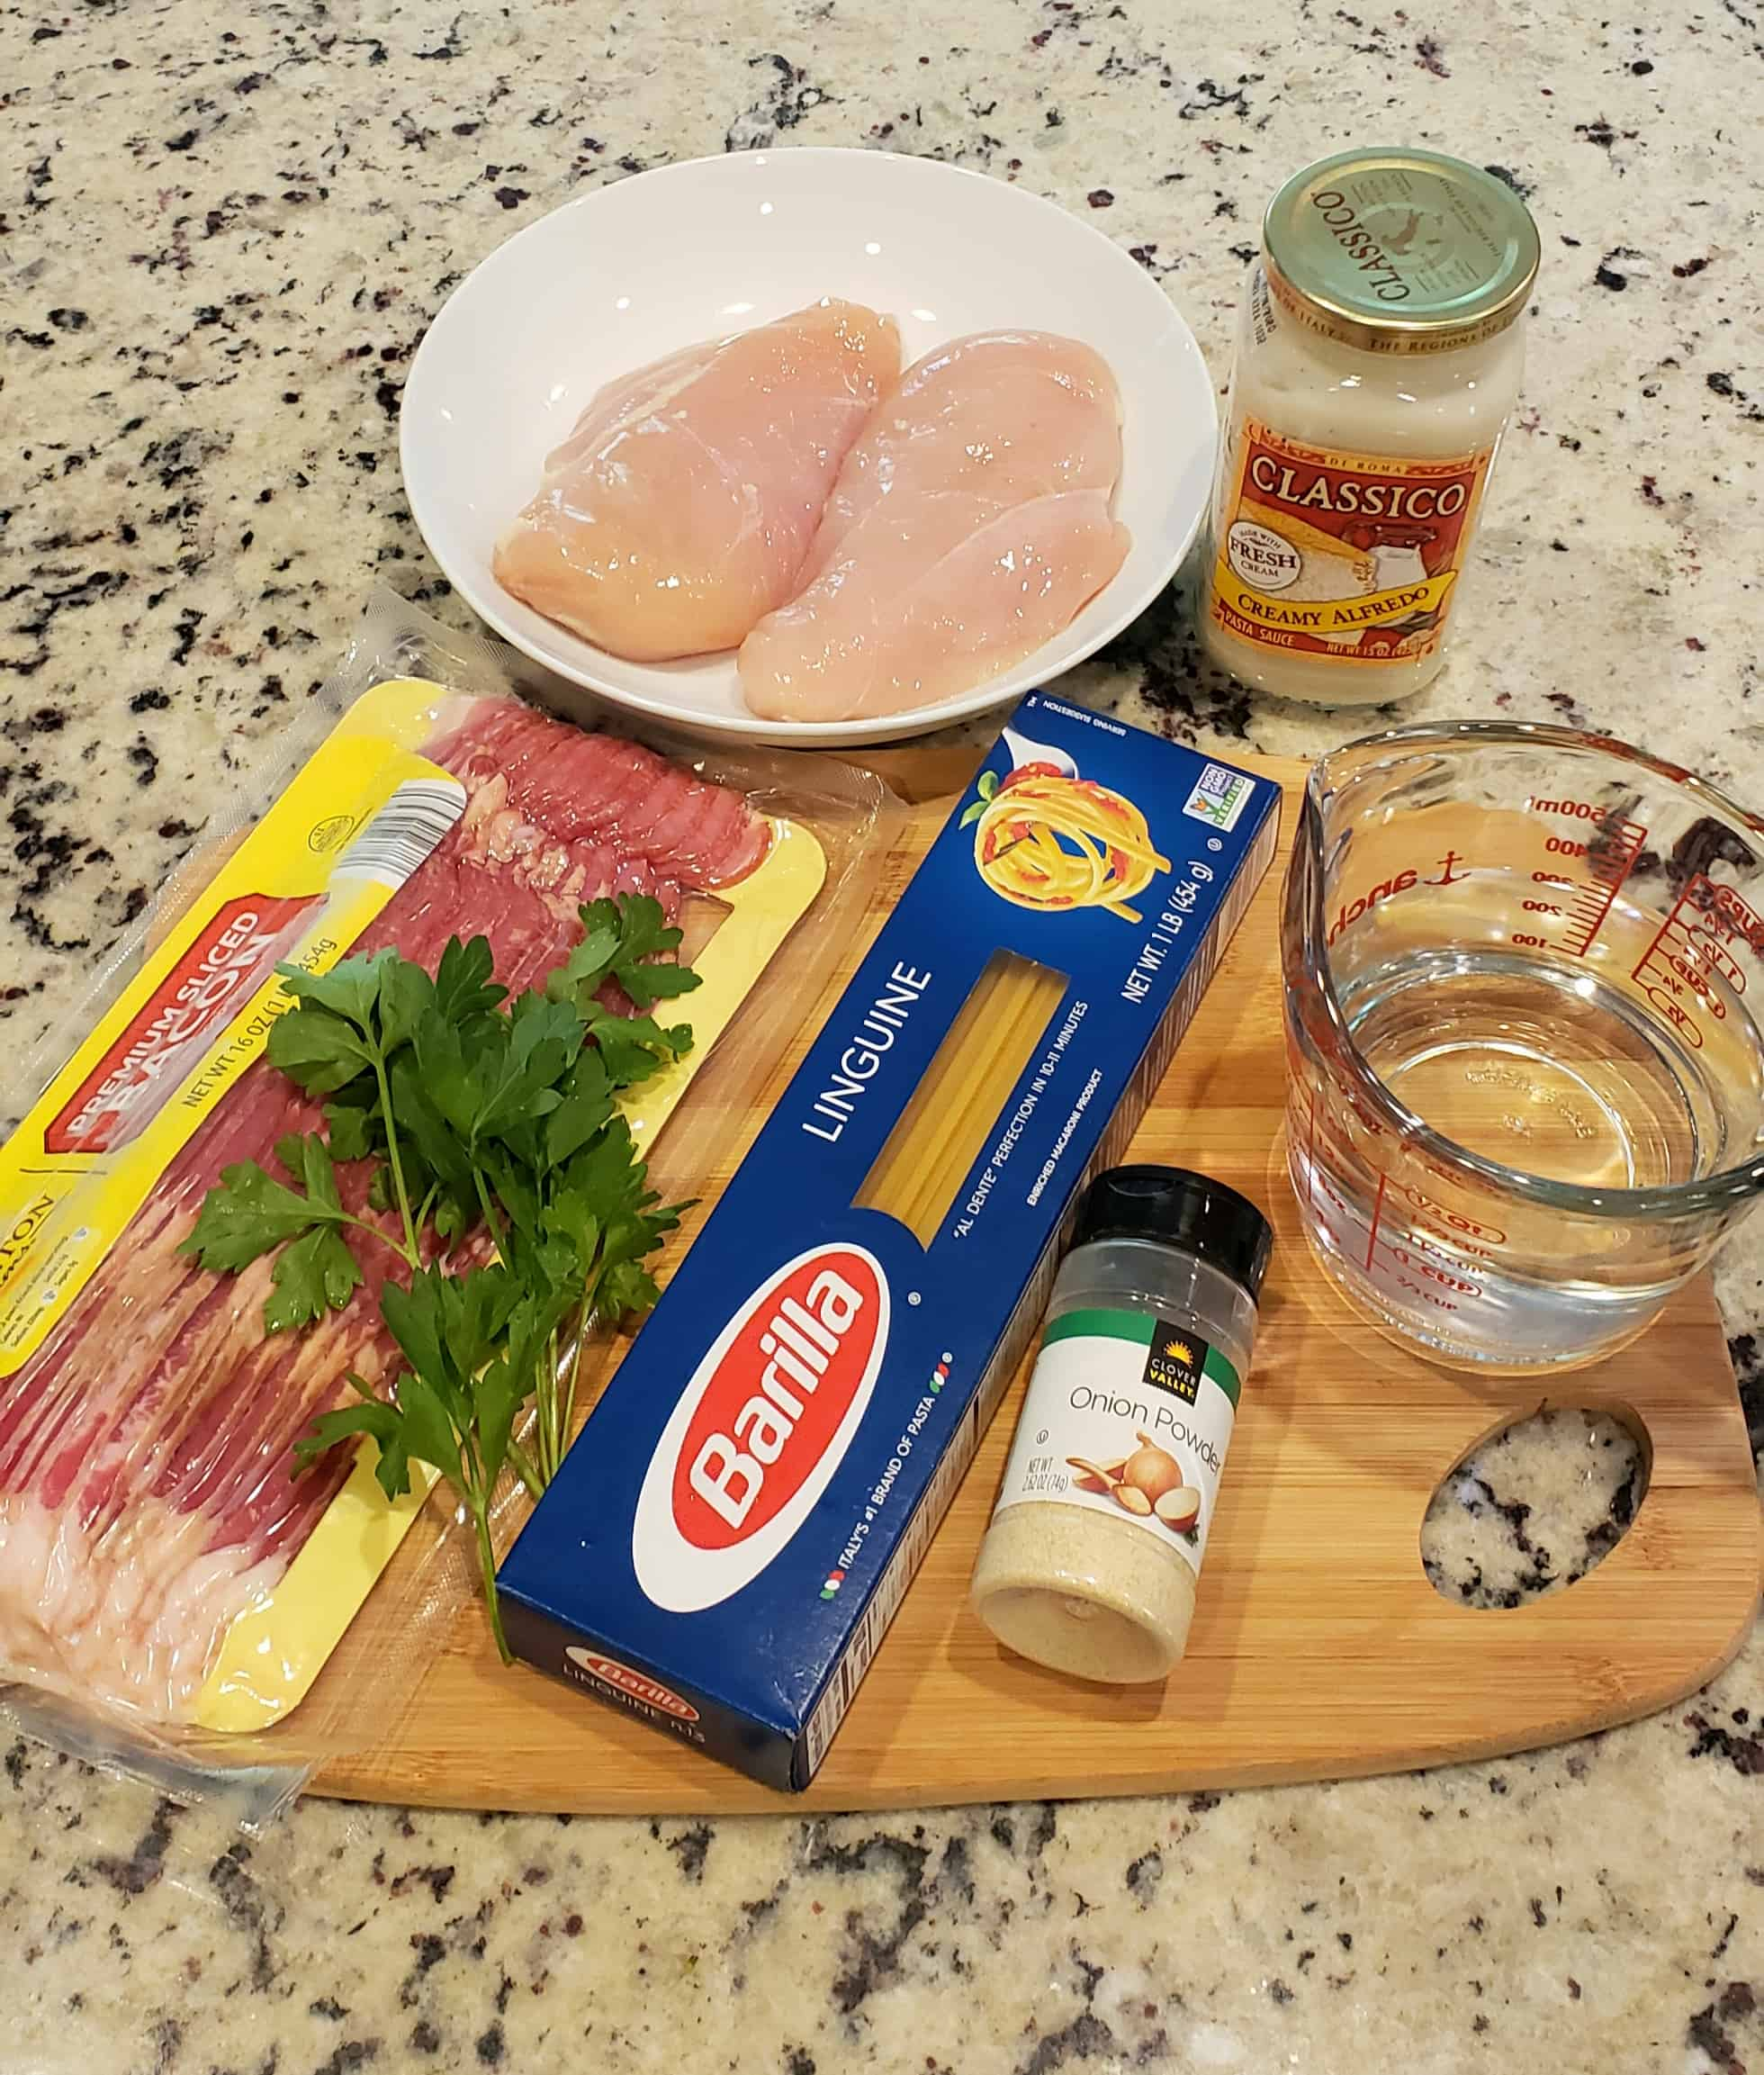 Ingredients on a wooden cutting board: chicken breasts, bacon, parsley, linguine, alfredo sauce, garlic powder water